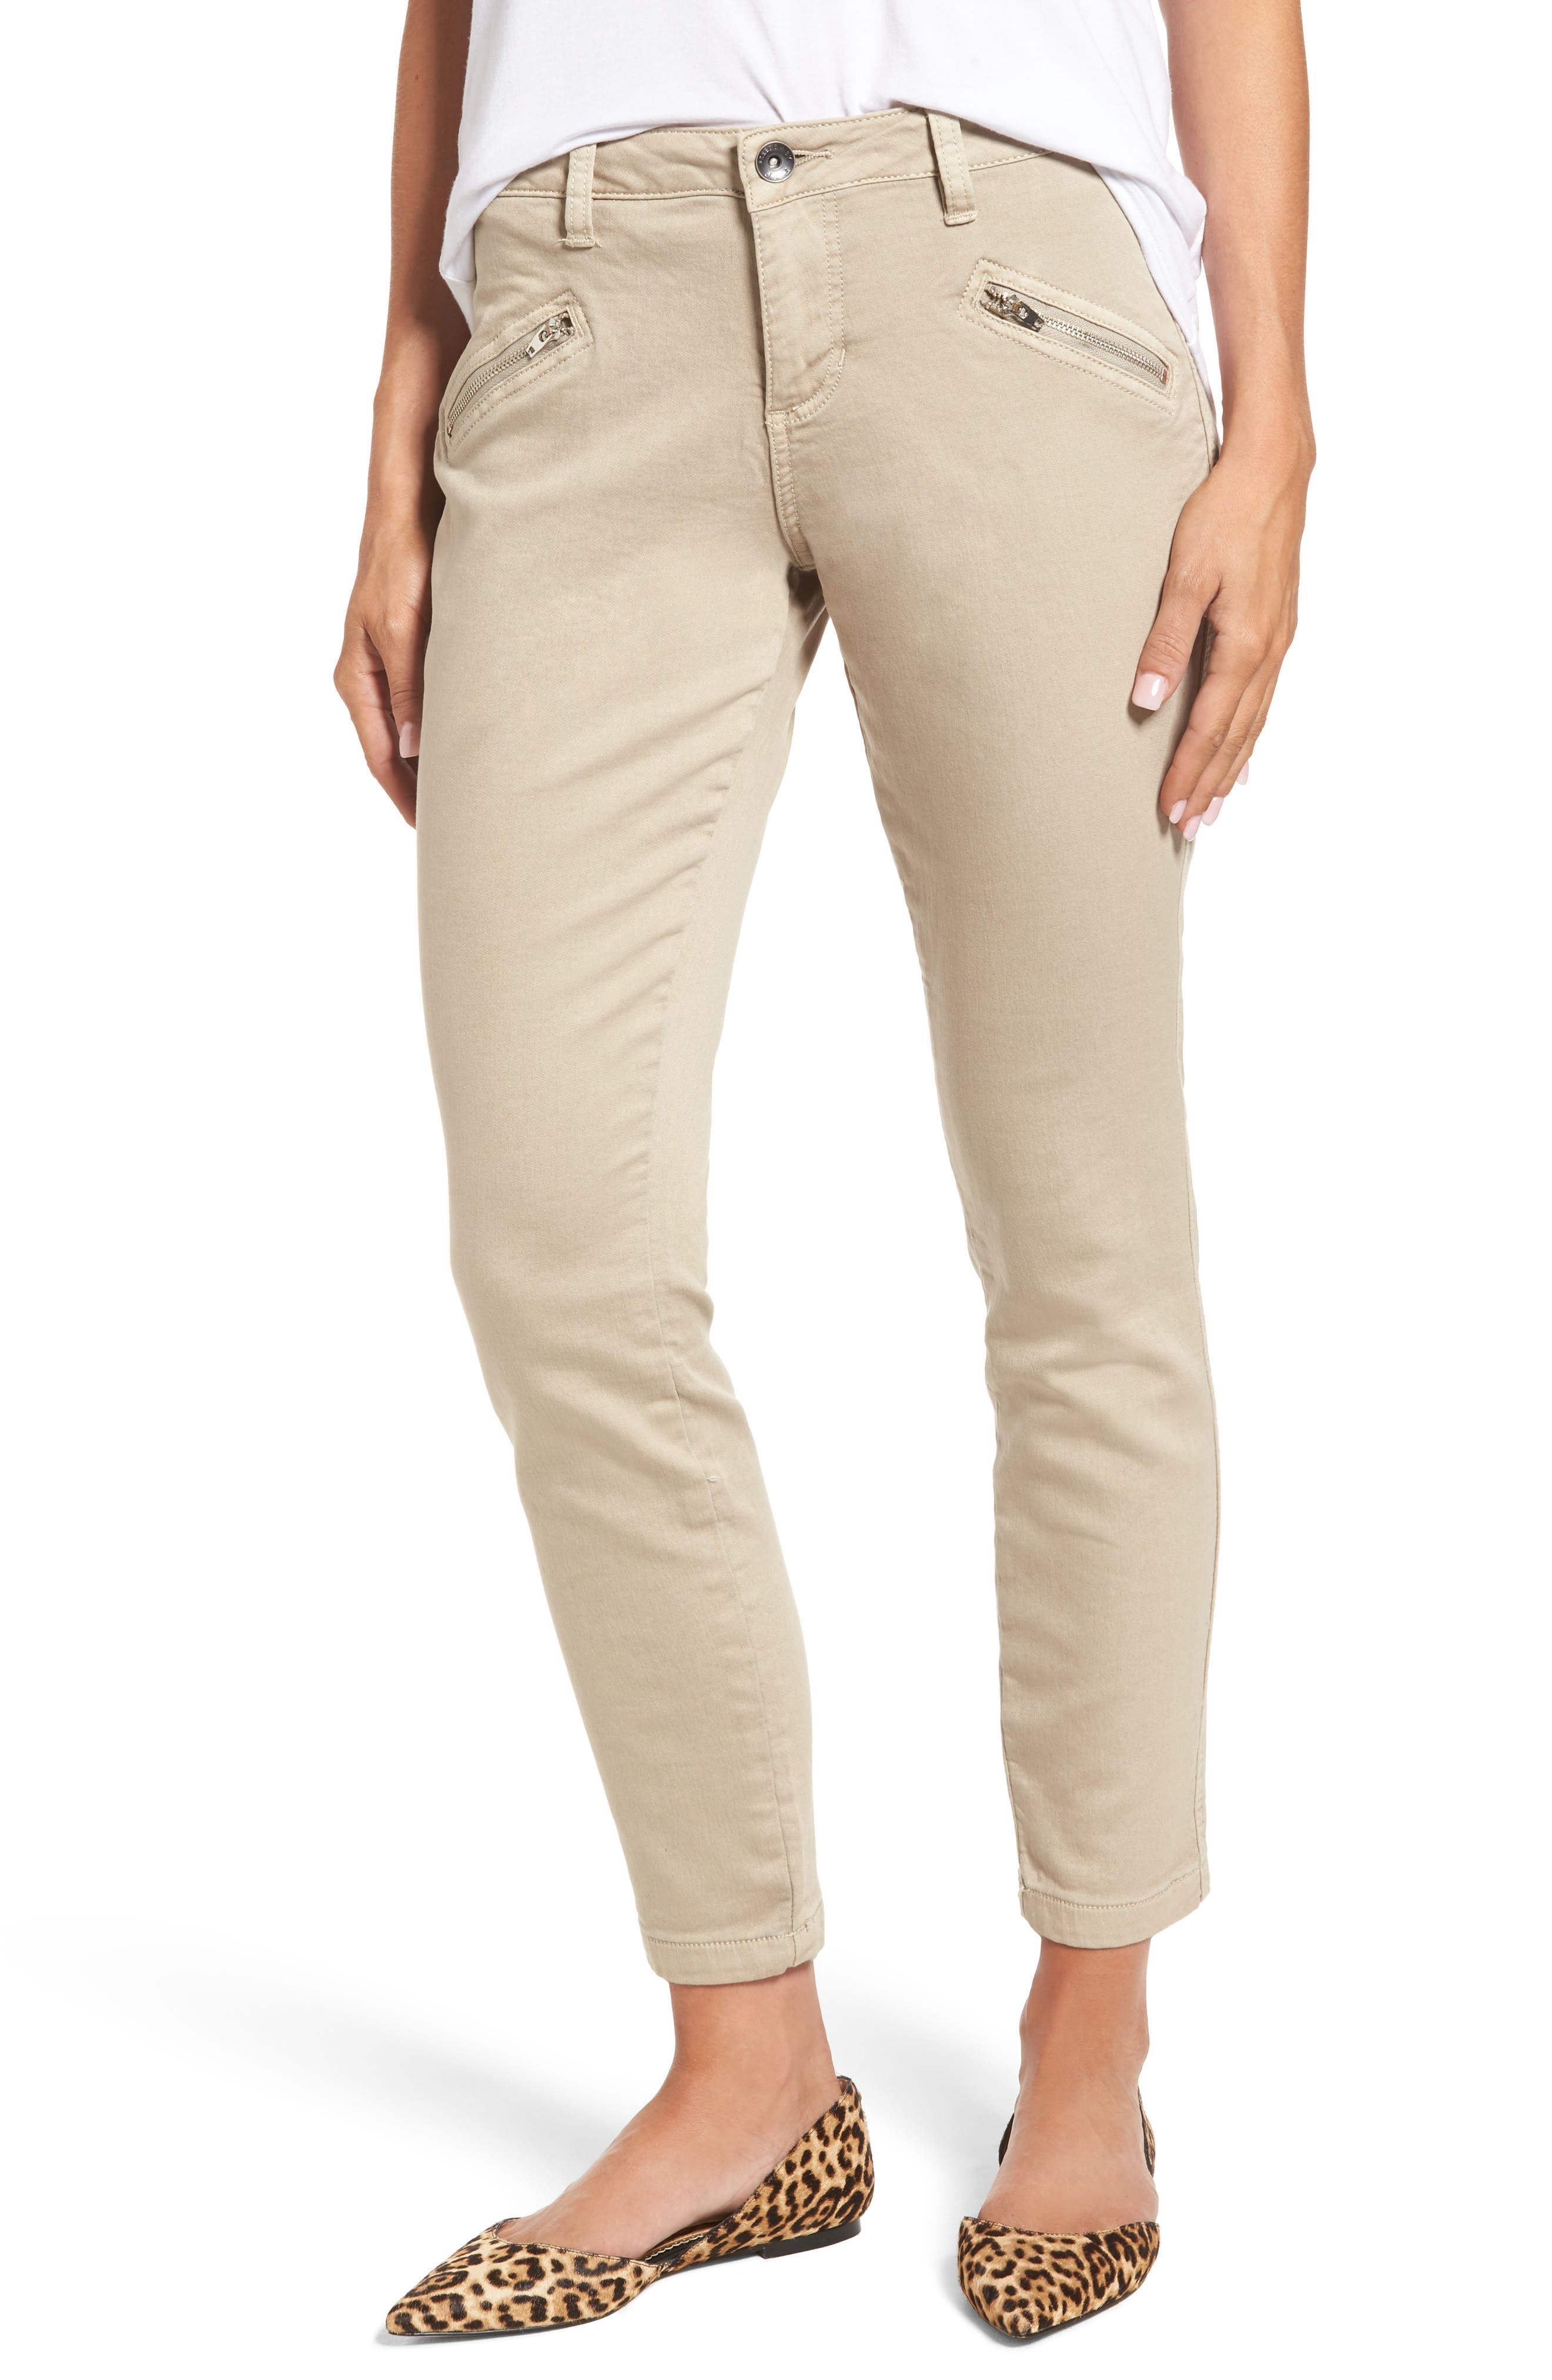 Ryan Knit Skinny Jeans,                             Main thumbnail 1, color,                             Birchwood